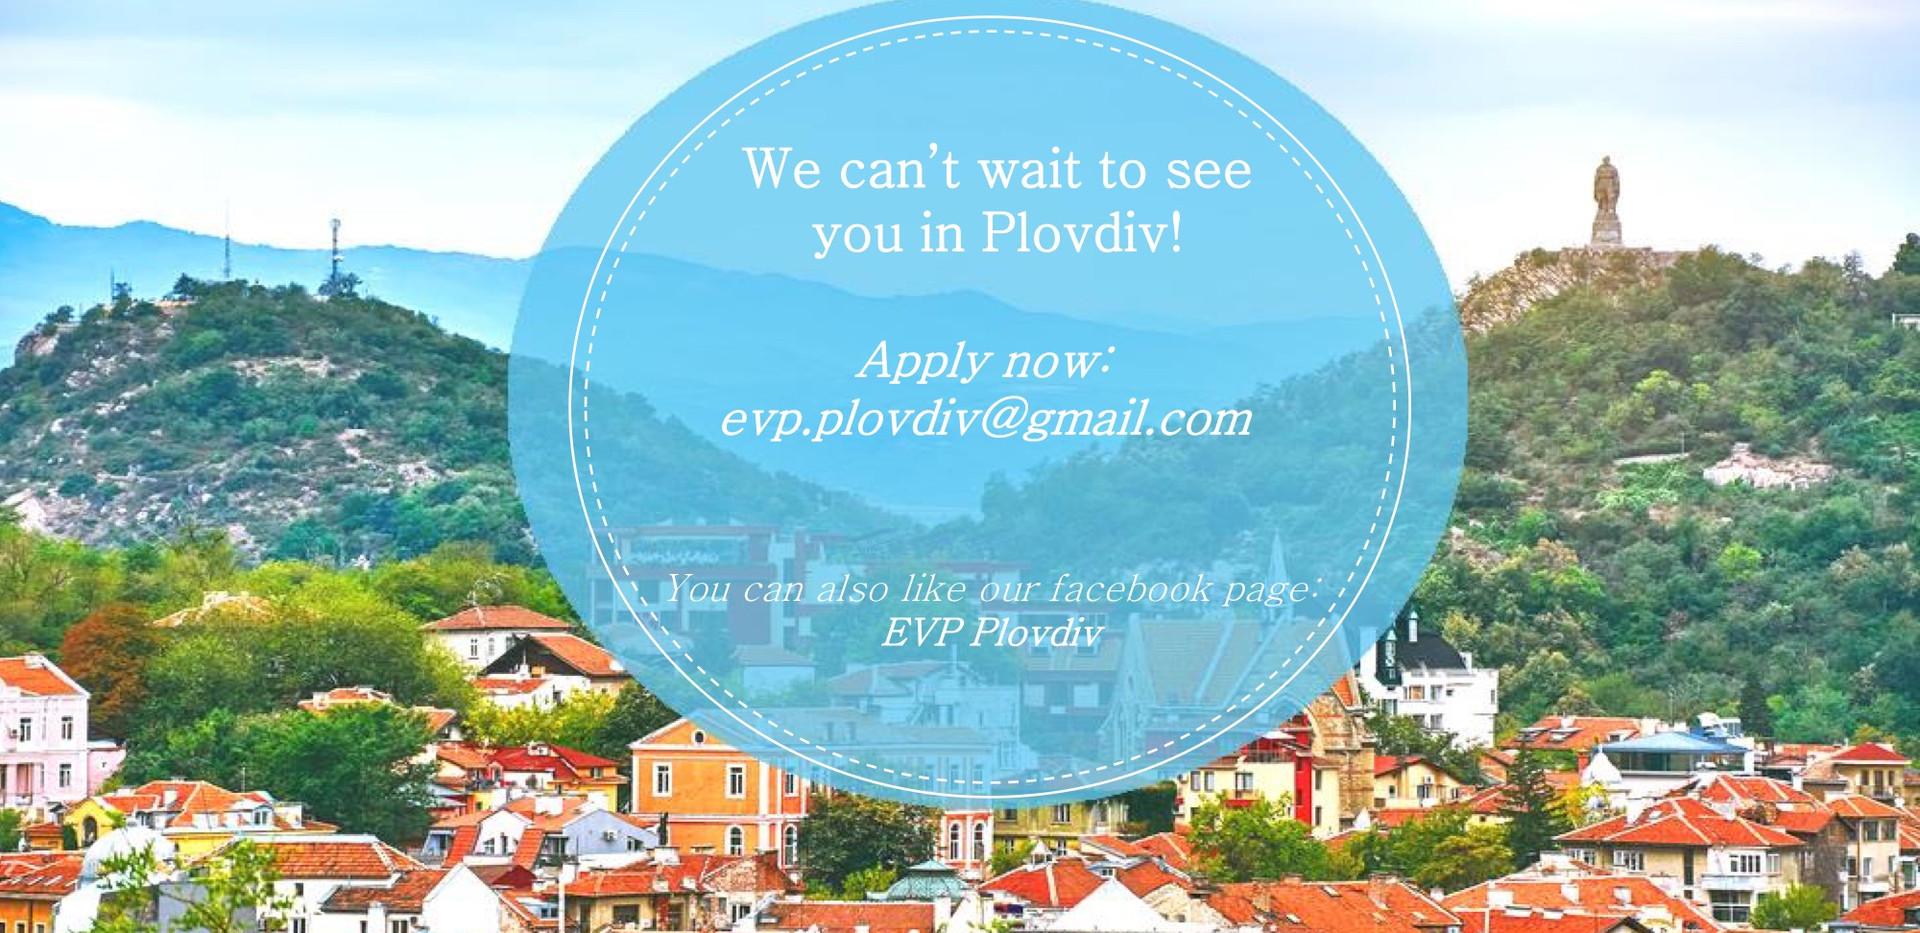 EVP_Plovdiv2019 (1) 5 1_9_2019.jpeg